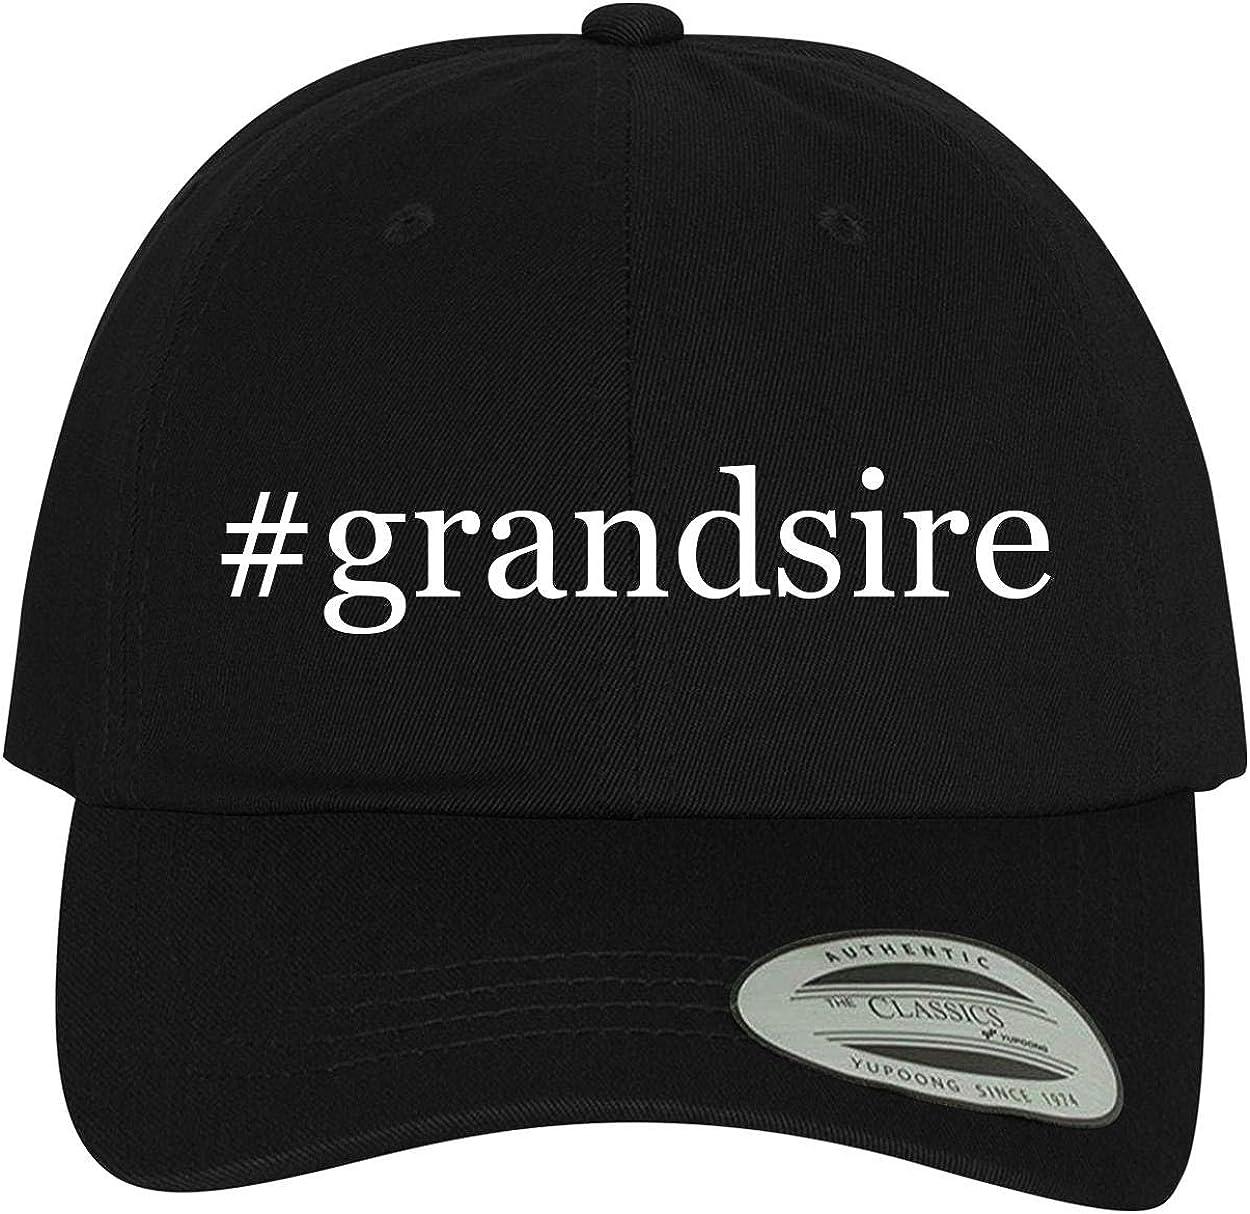 Comfortable Dad Hat Baseball Cap BH Cool Designs #Grandsire